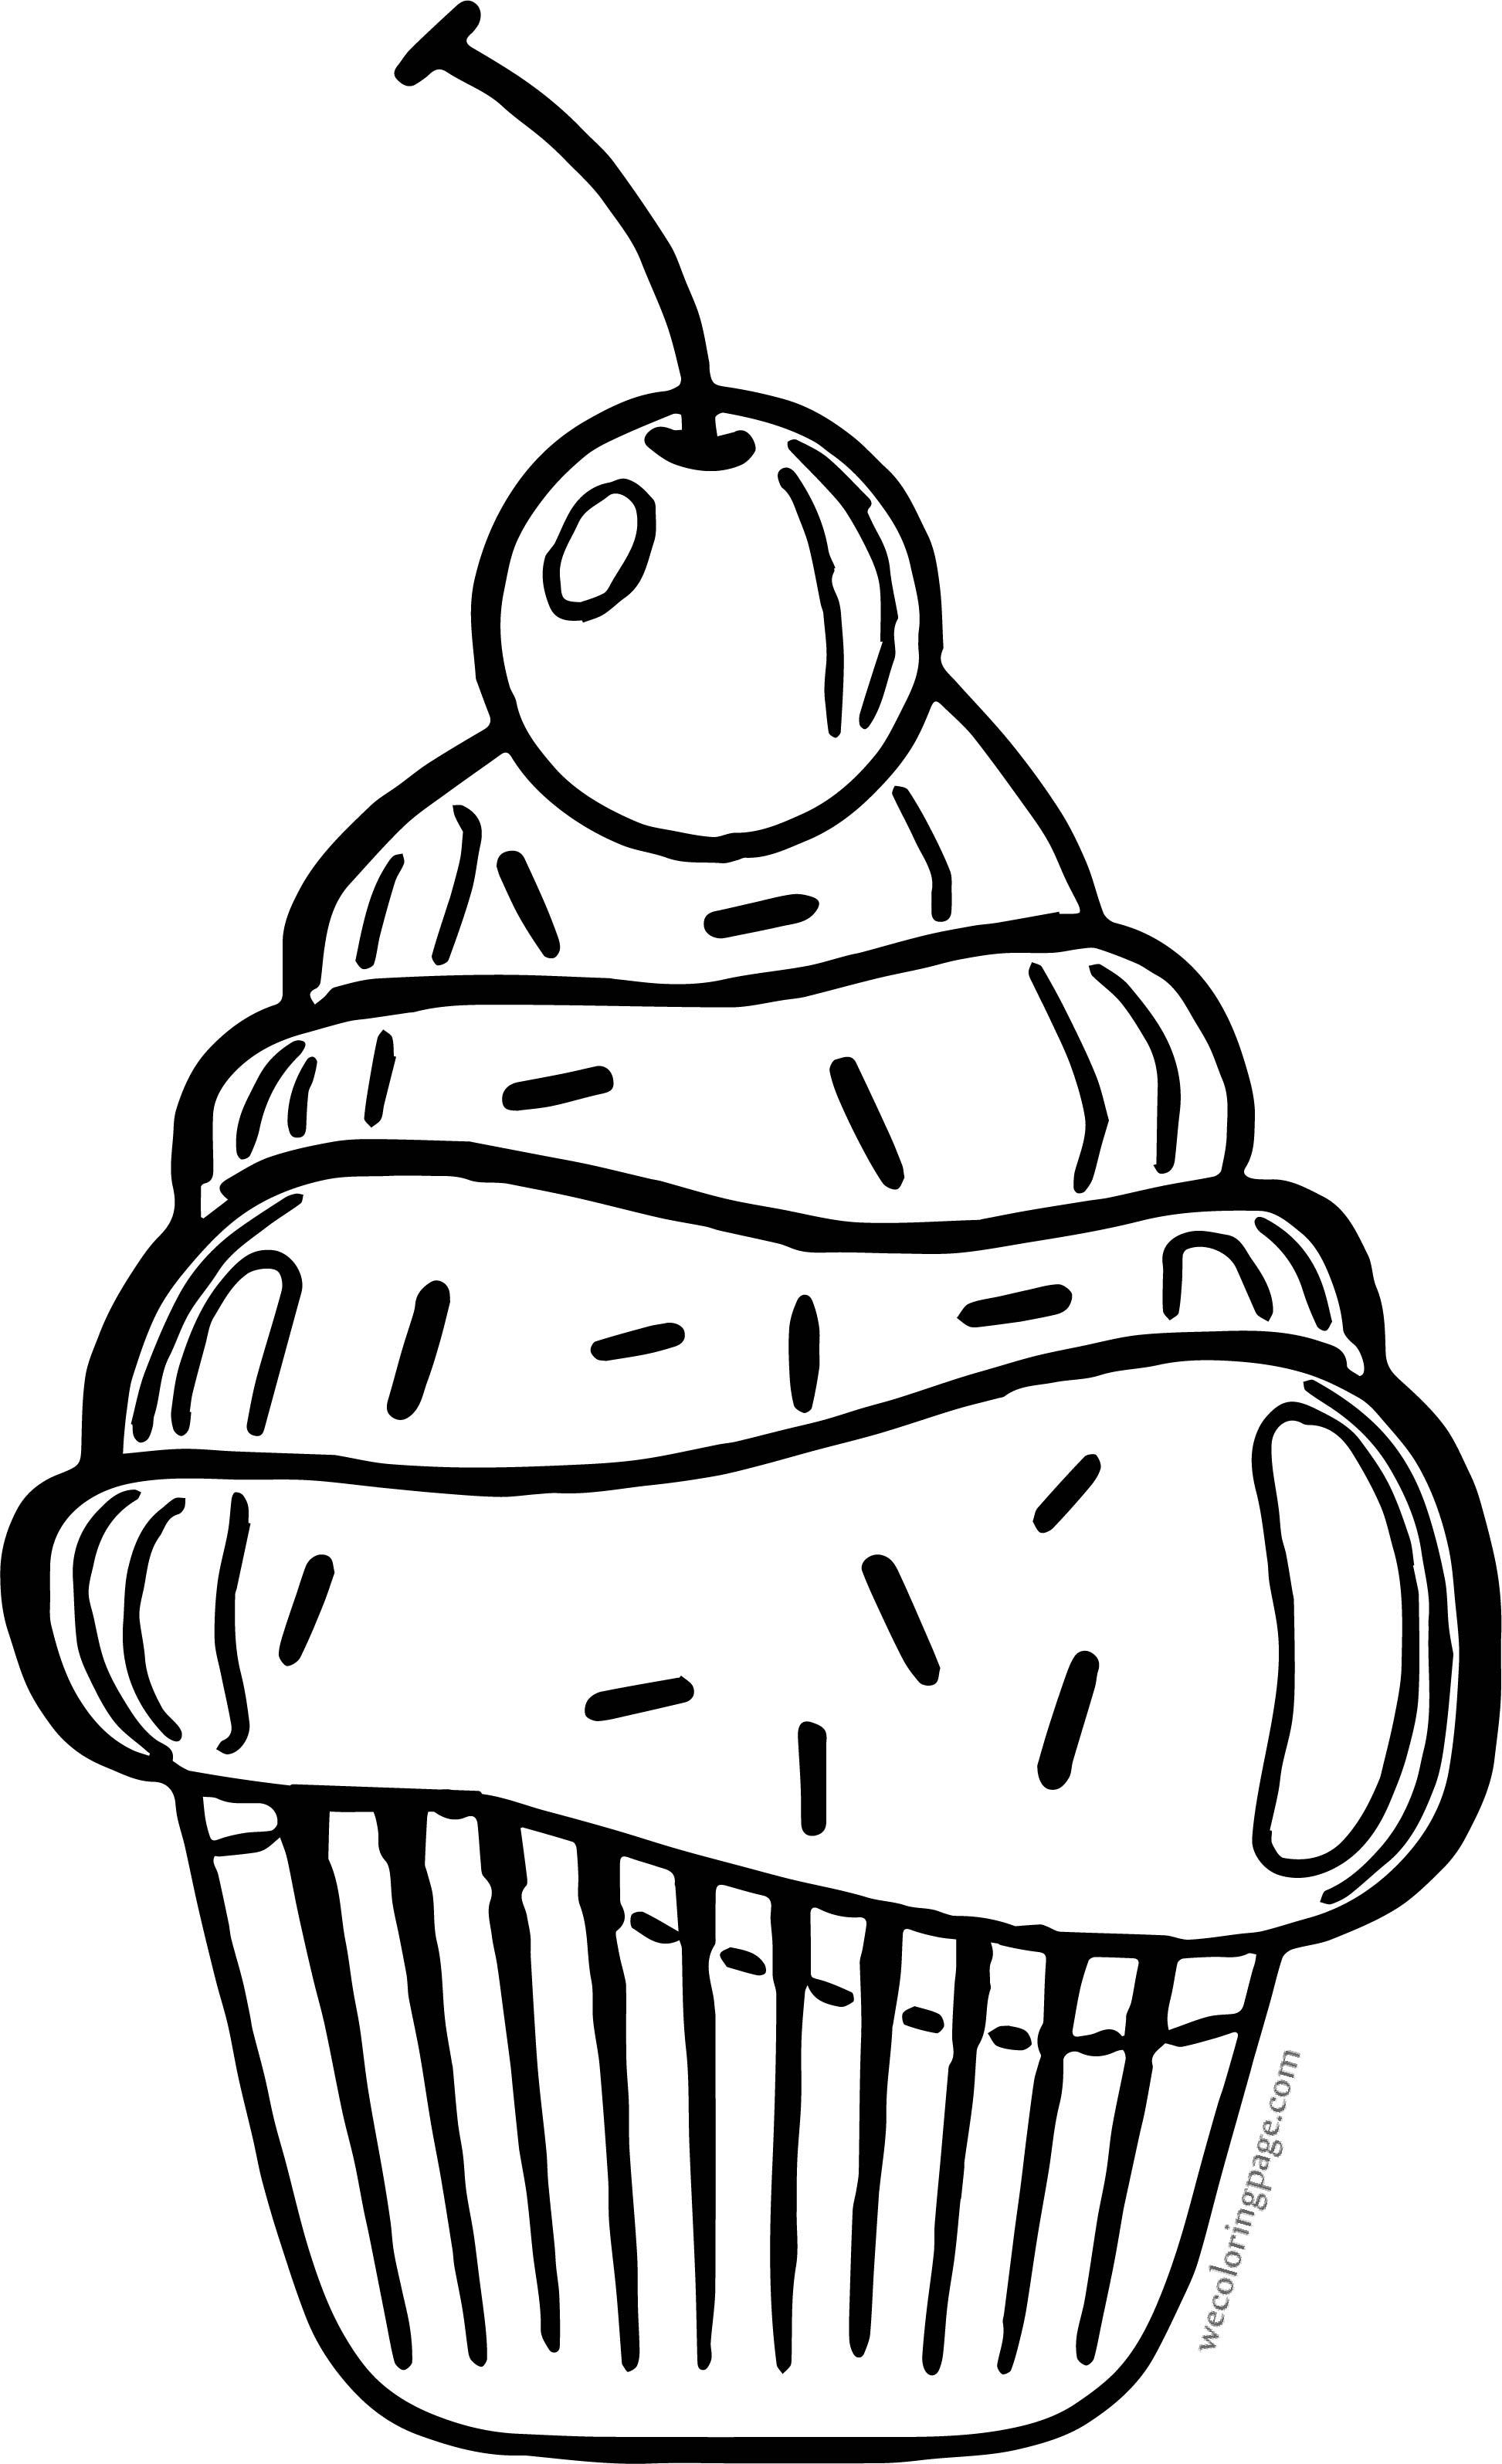 Cartoon Cherry Big Cupcake Crema Coloring Page